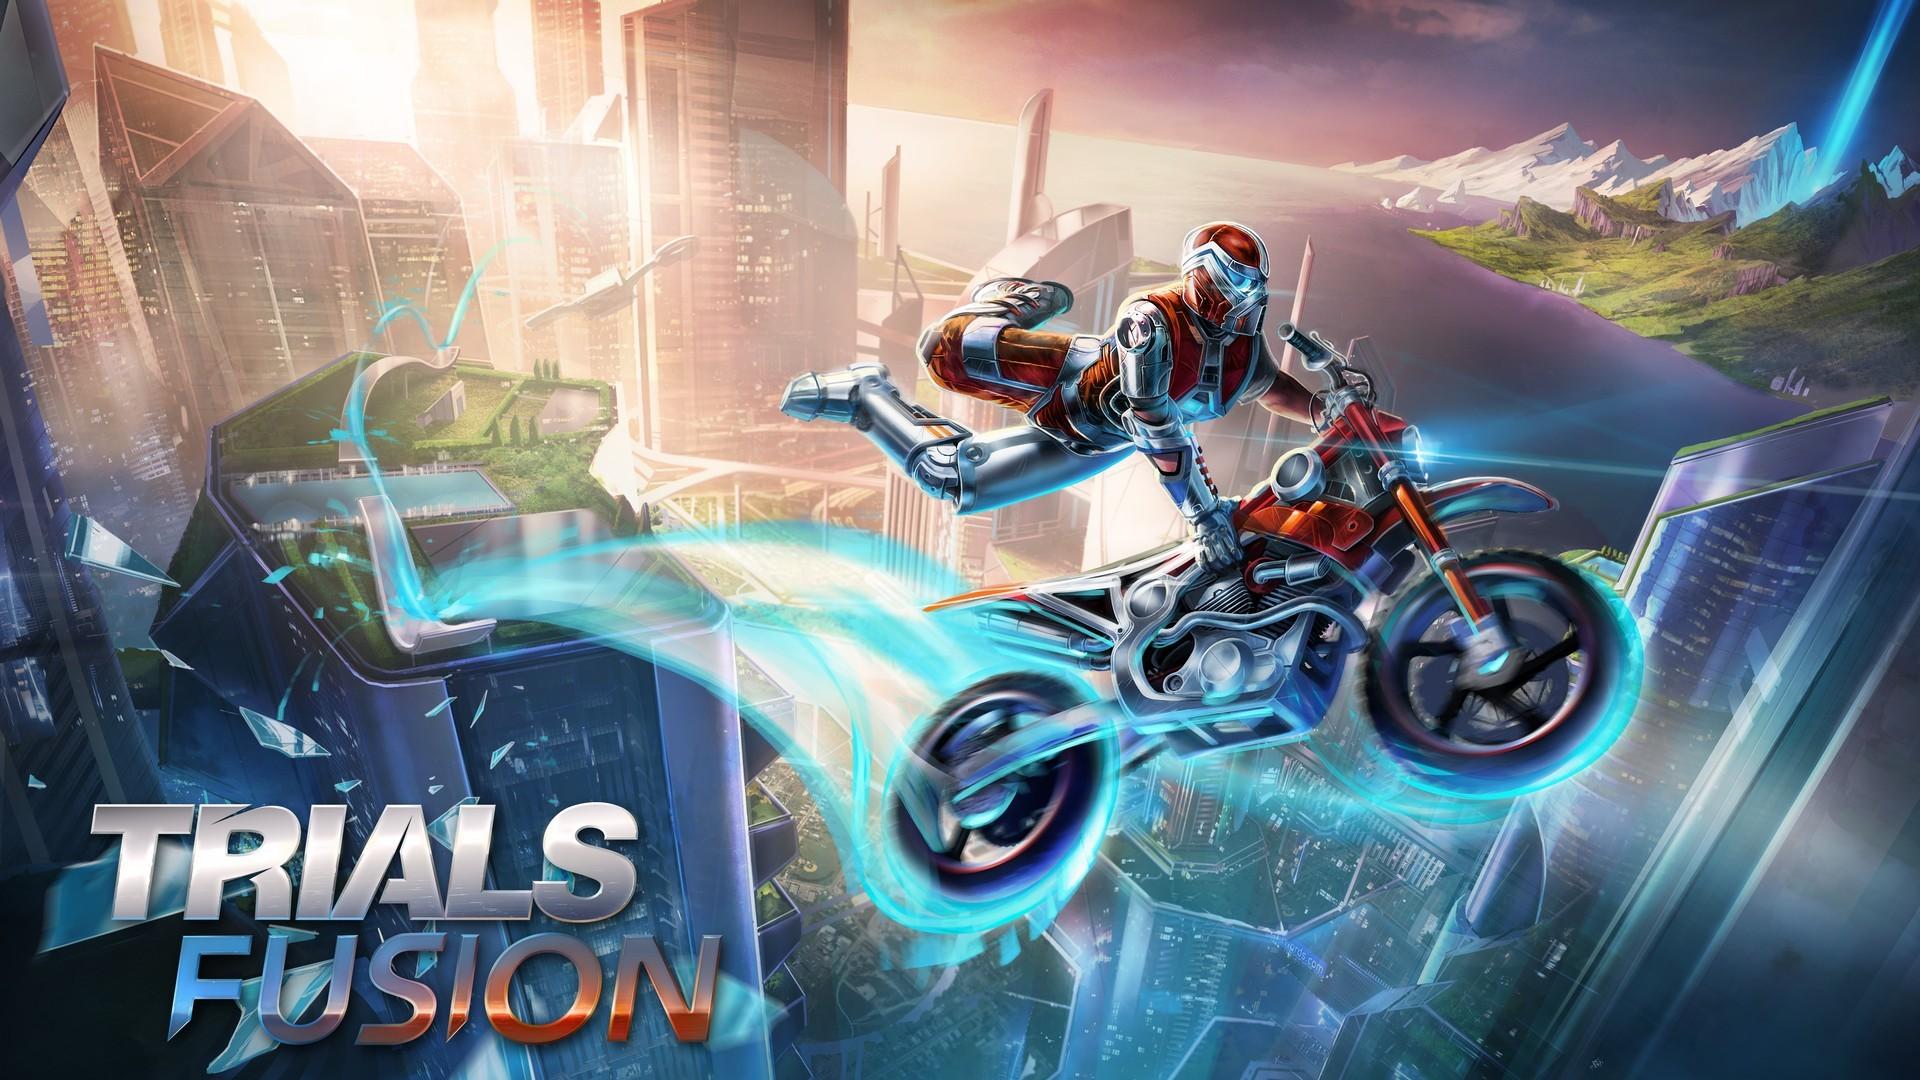 trials fusion video game hd wallpaper 54259